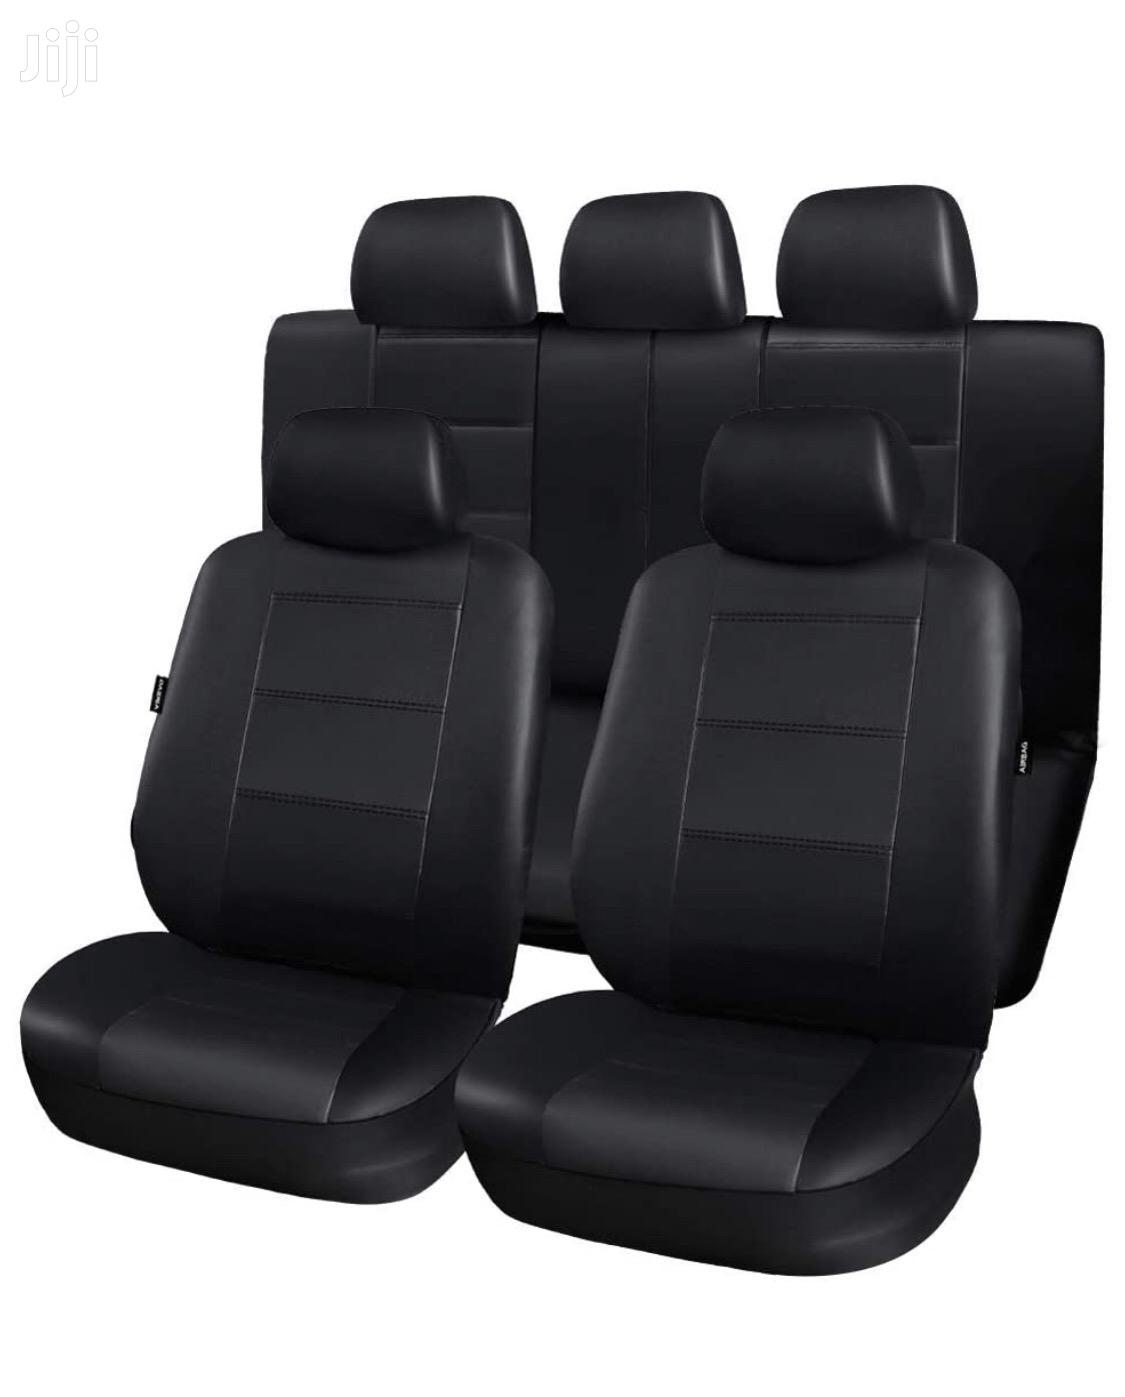 Full Set Car Seat Covers Black